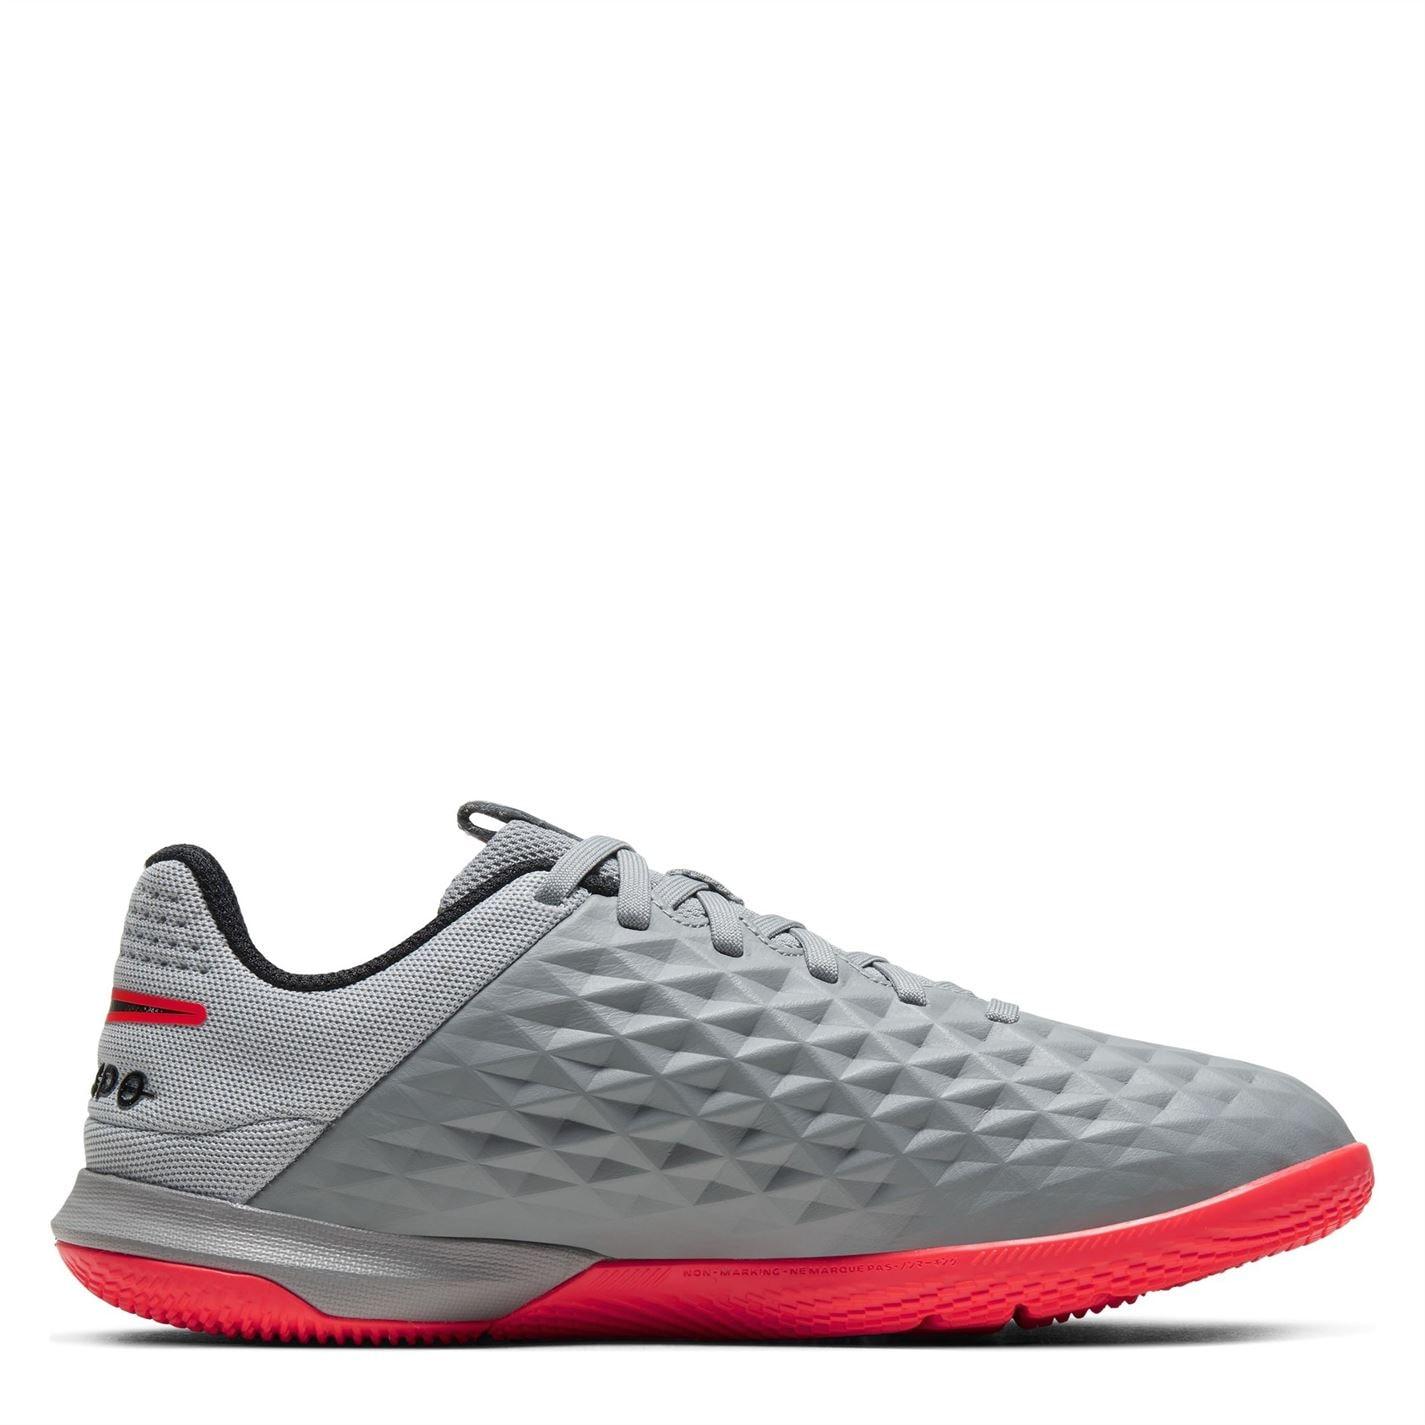 Mergi la Adidasi fotbal de sala Nike Tiempo Legend 8 Academy pentru copii bomber gri